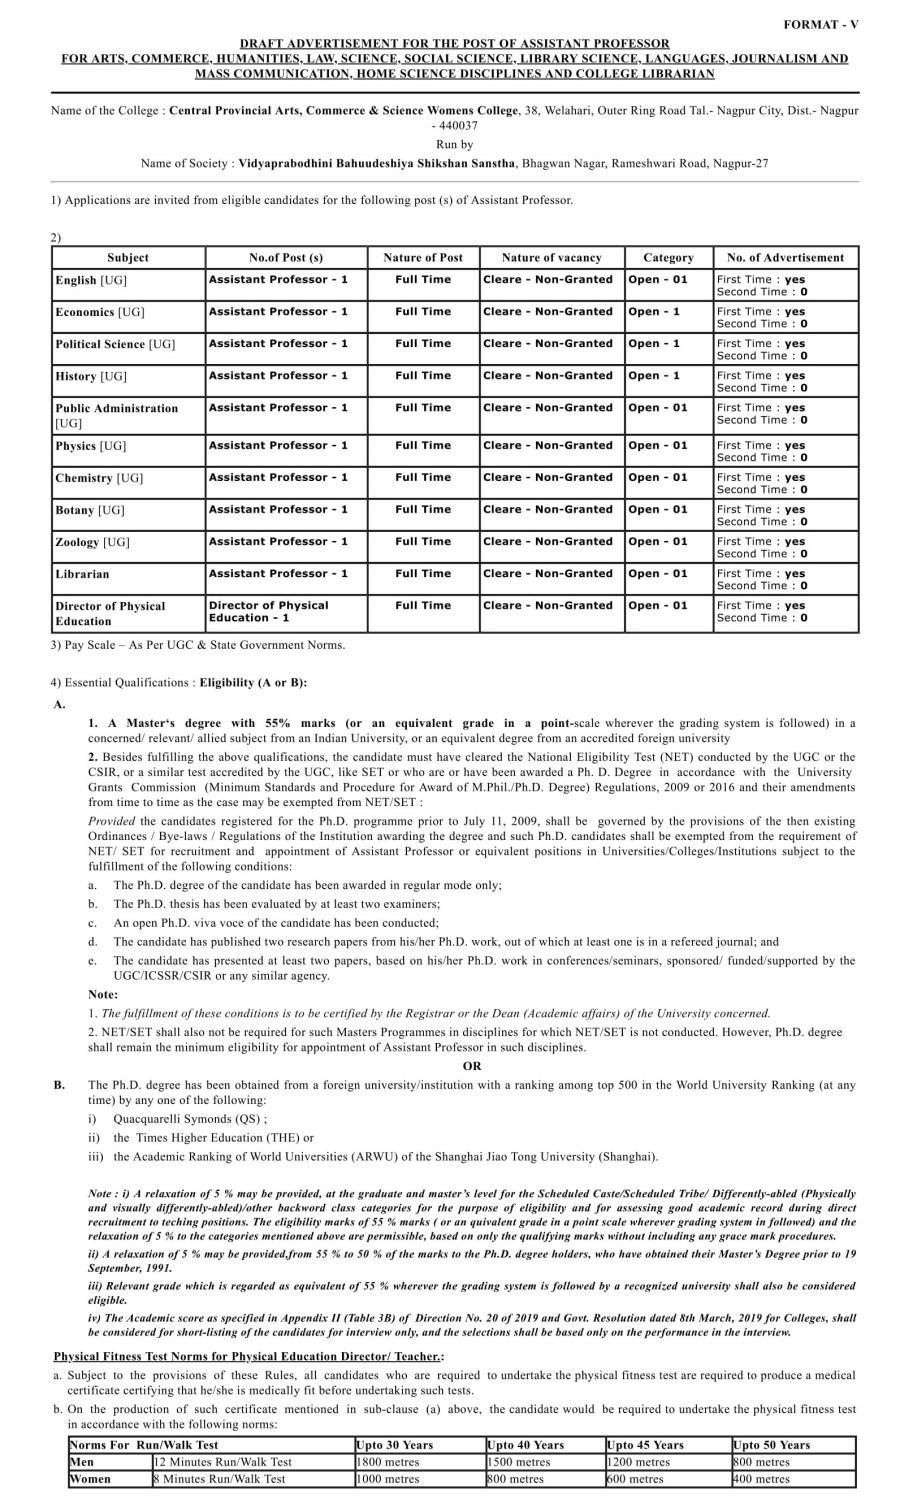 Rashtrasant Tukadoji Maharaj Nagpur University __ OAASIS-1